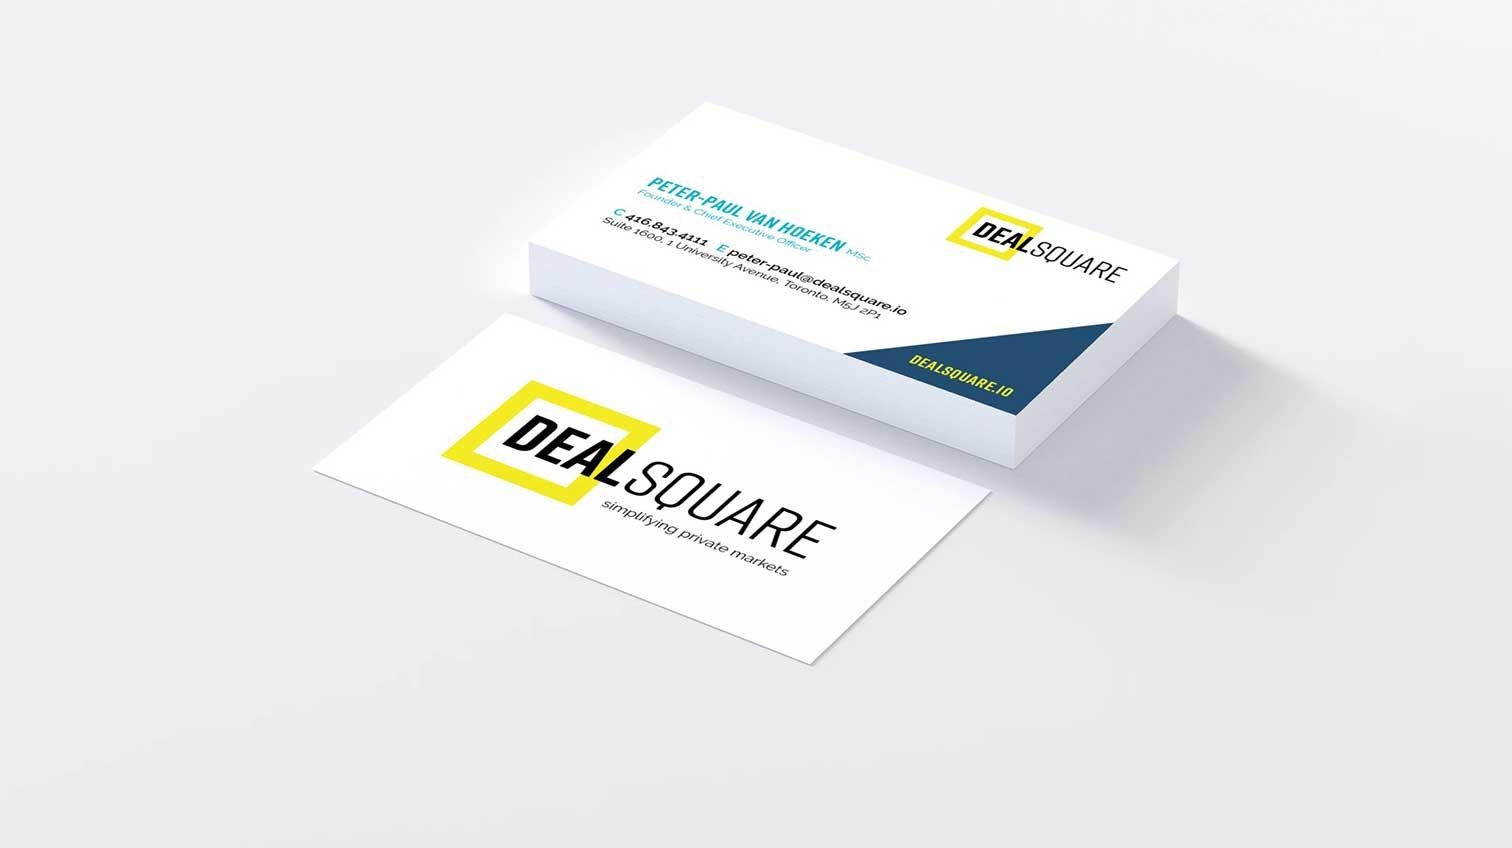 DealSquare business cards - White Canvas Design